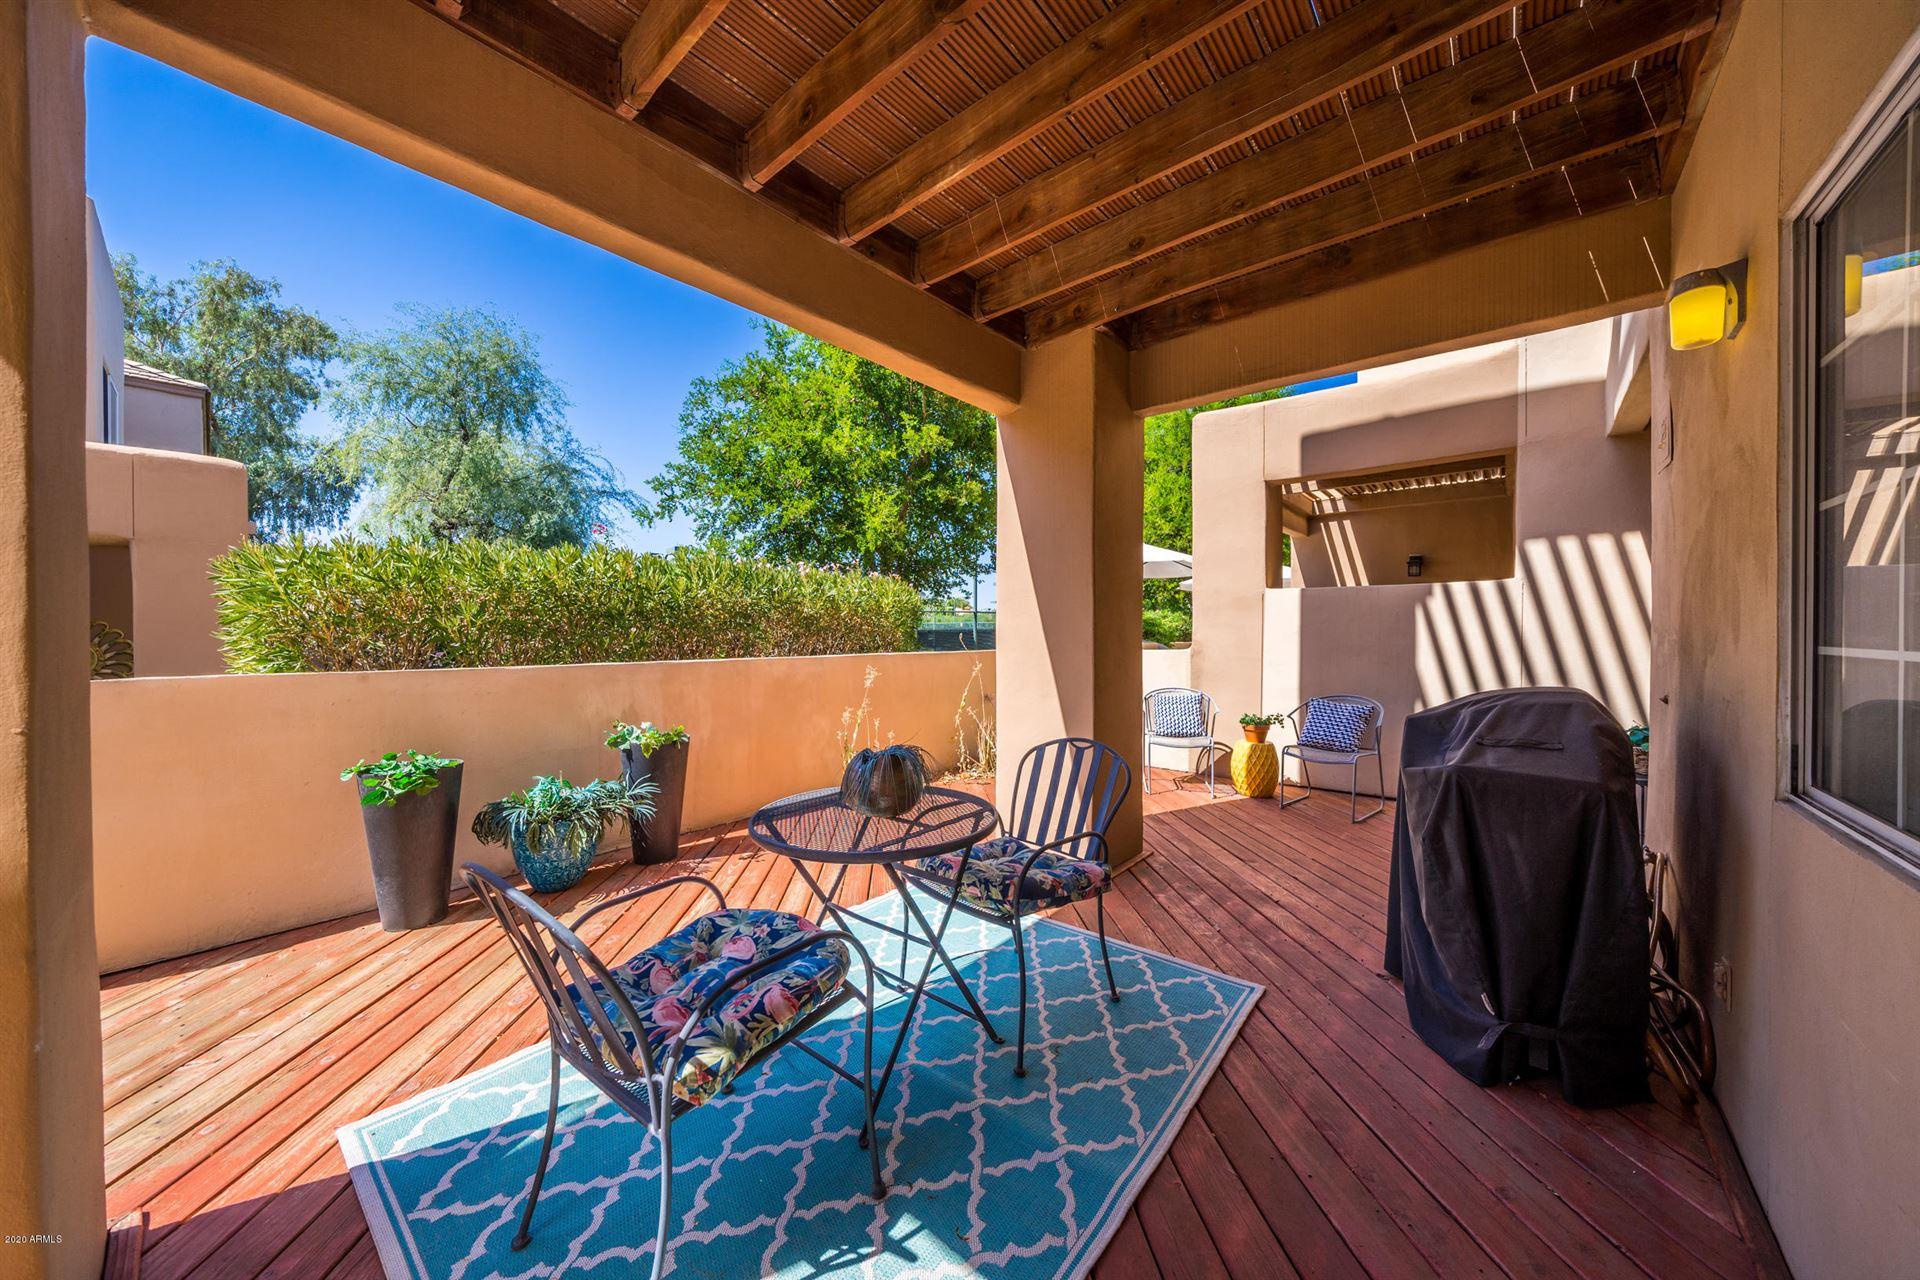 7710 E GAINEY RANCH Road #112, Scottsdale, AZ 85258 - MLS#: 6129240